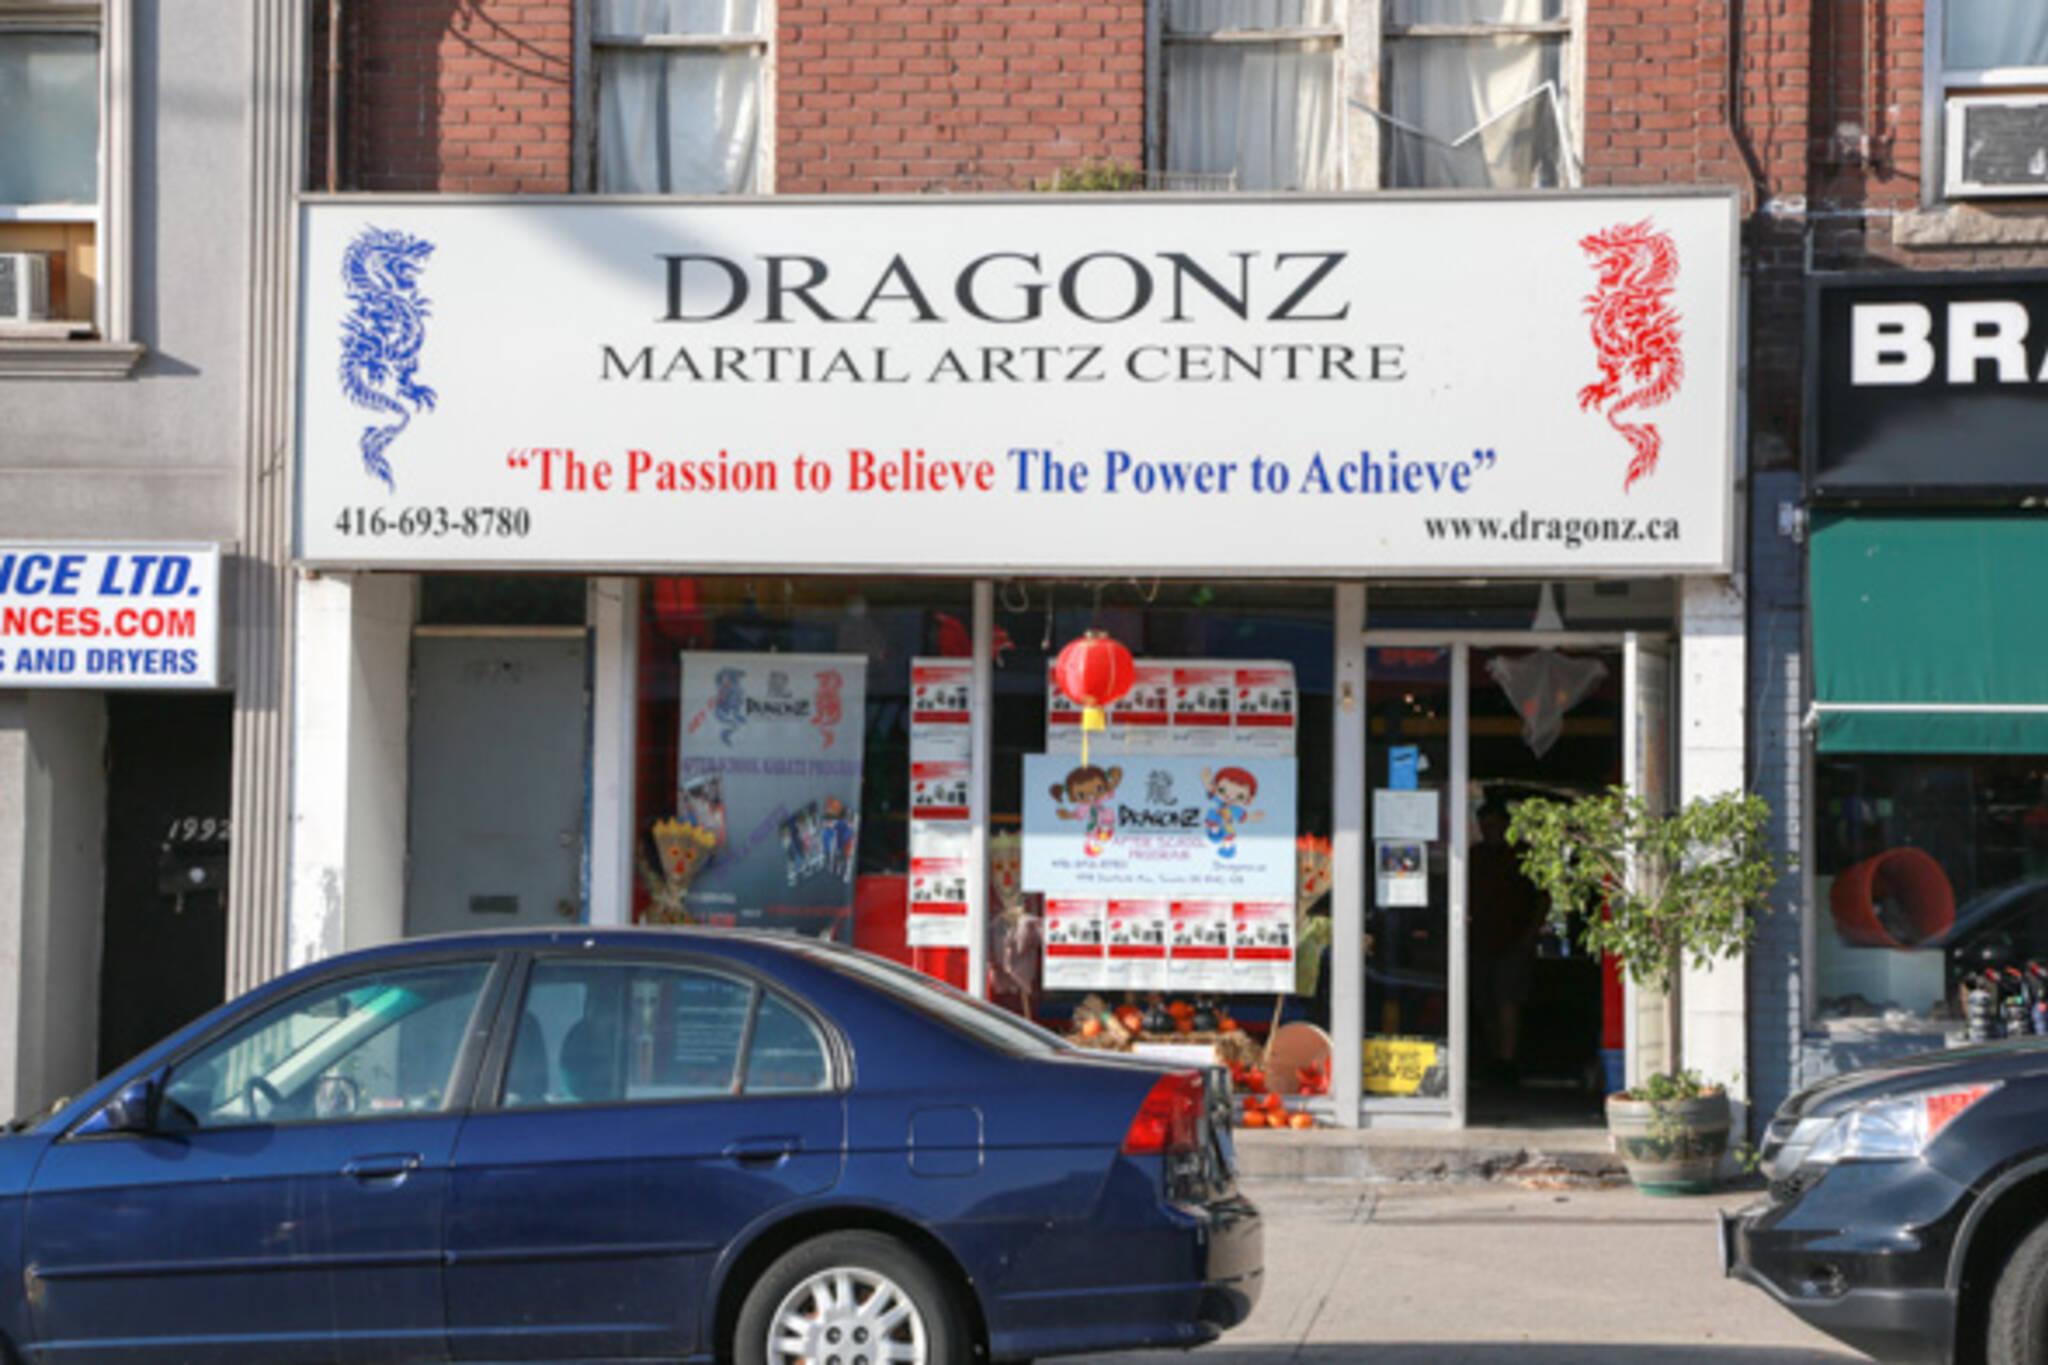 dragonz martial artz centre